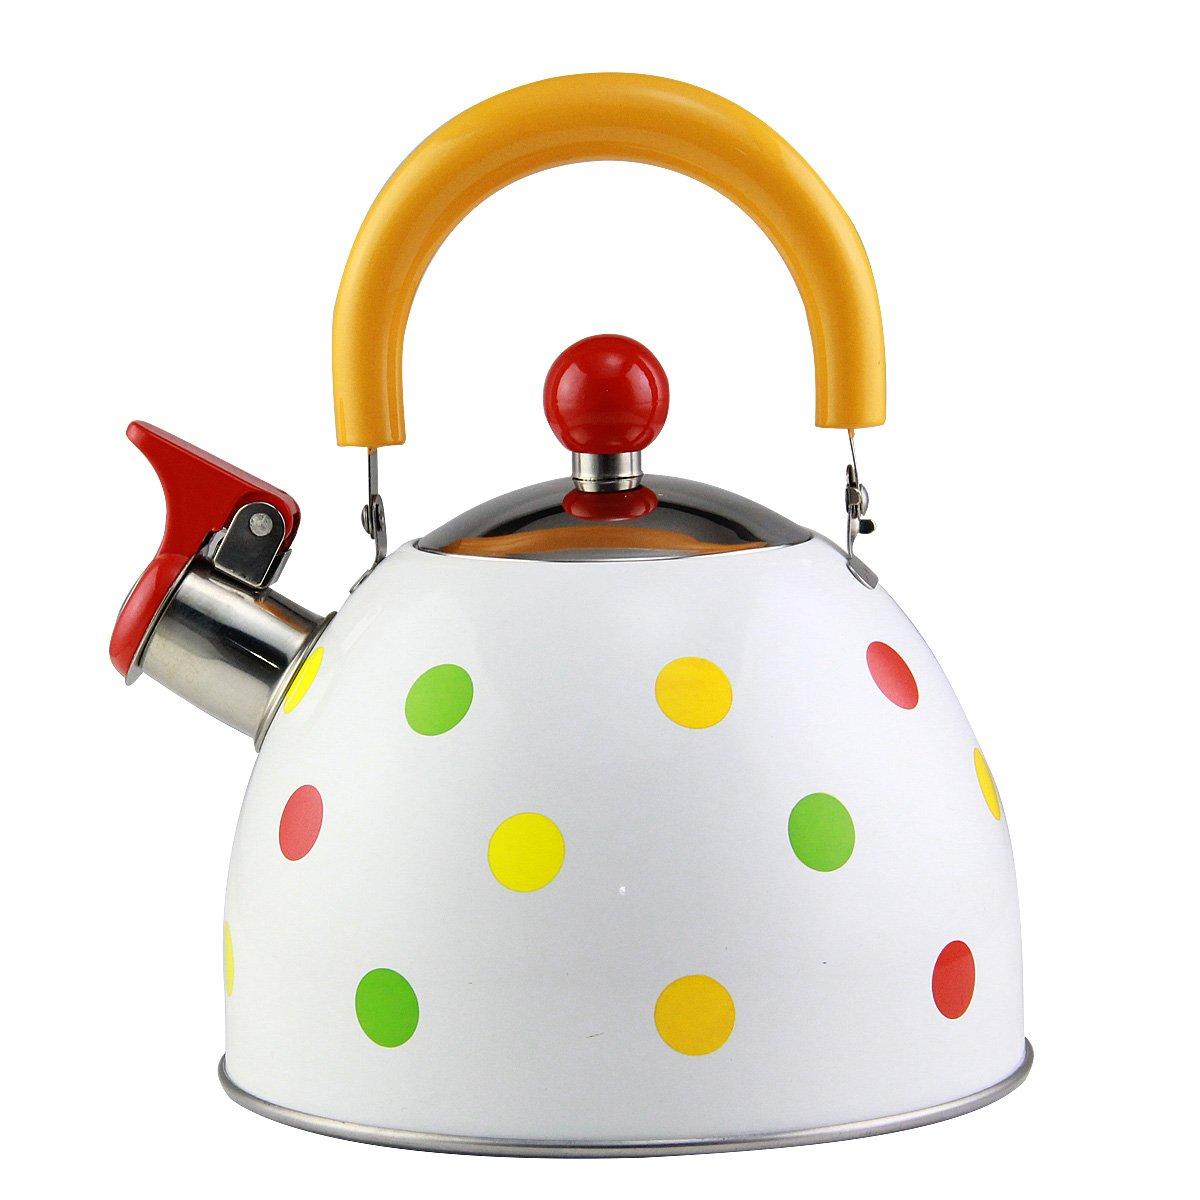 Riwendell 2.7 Quart Whistling Color Dot Tea Kettle Stainless Steel StoveTop Teapot (GS-04102-2.5L)